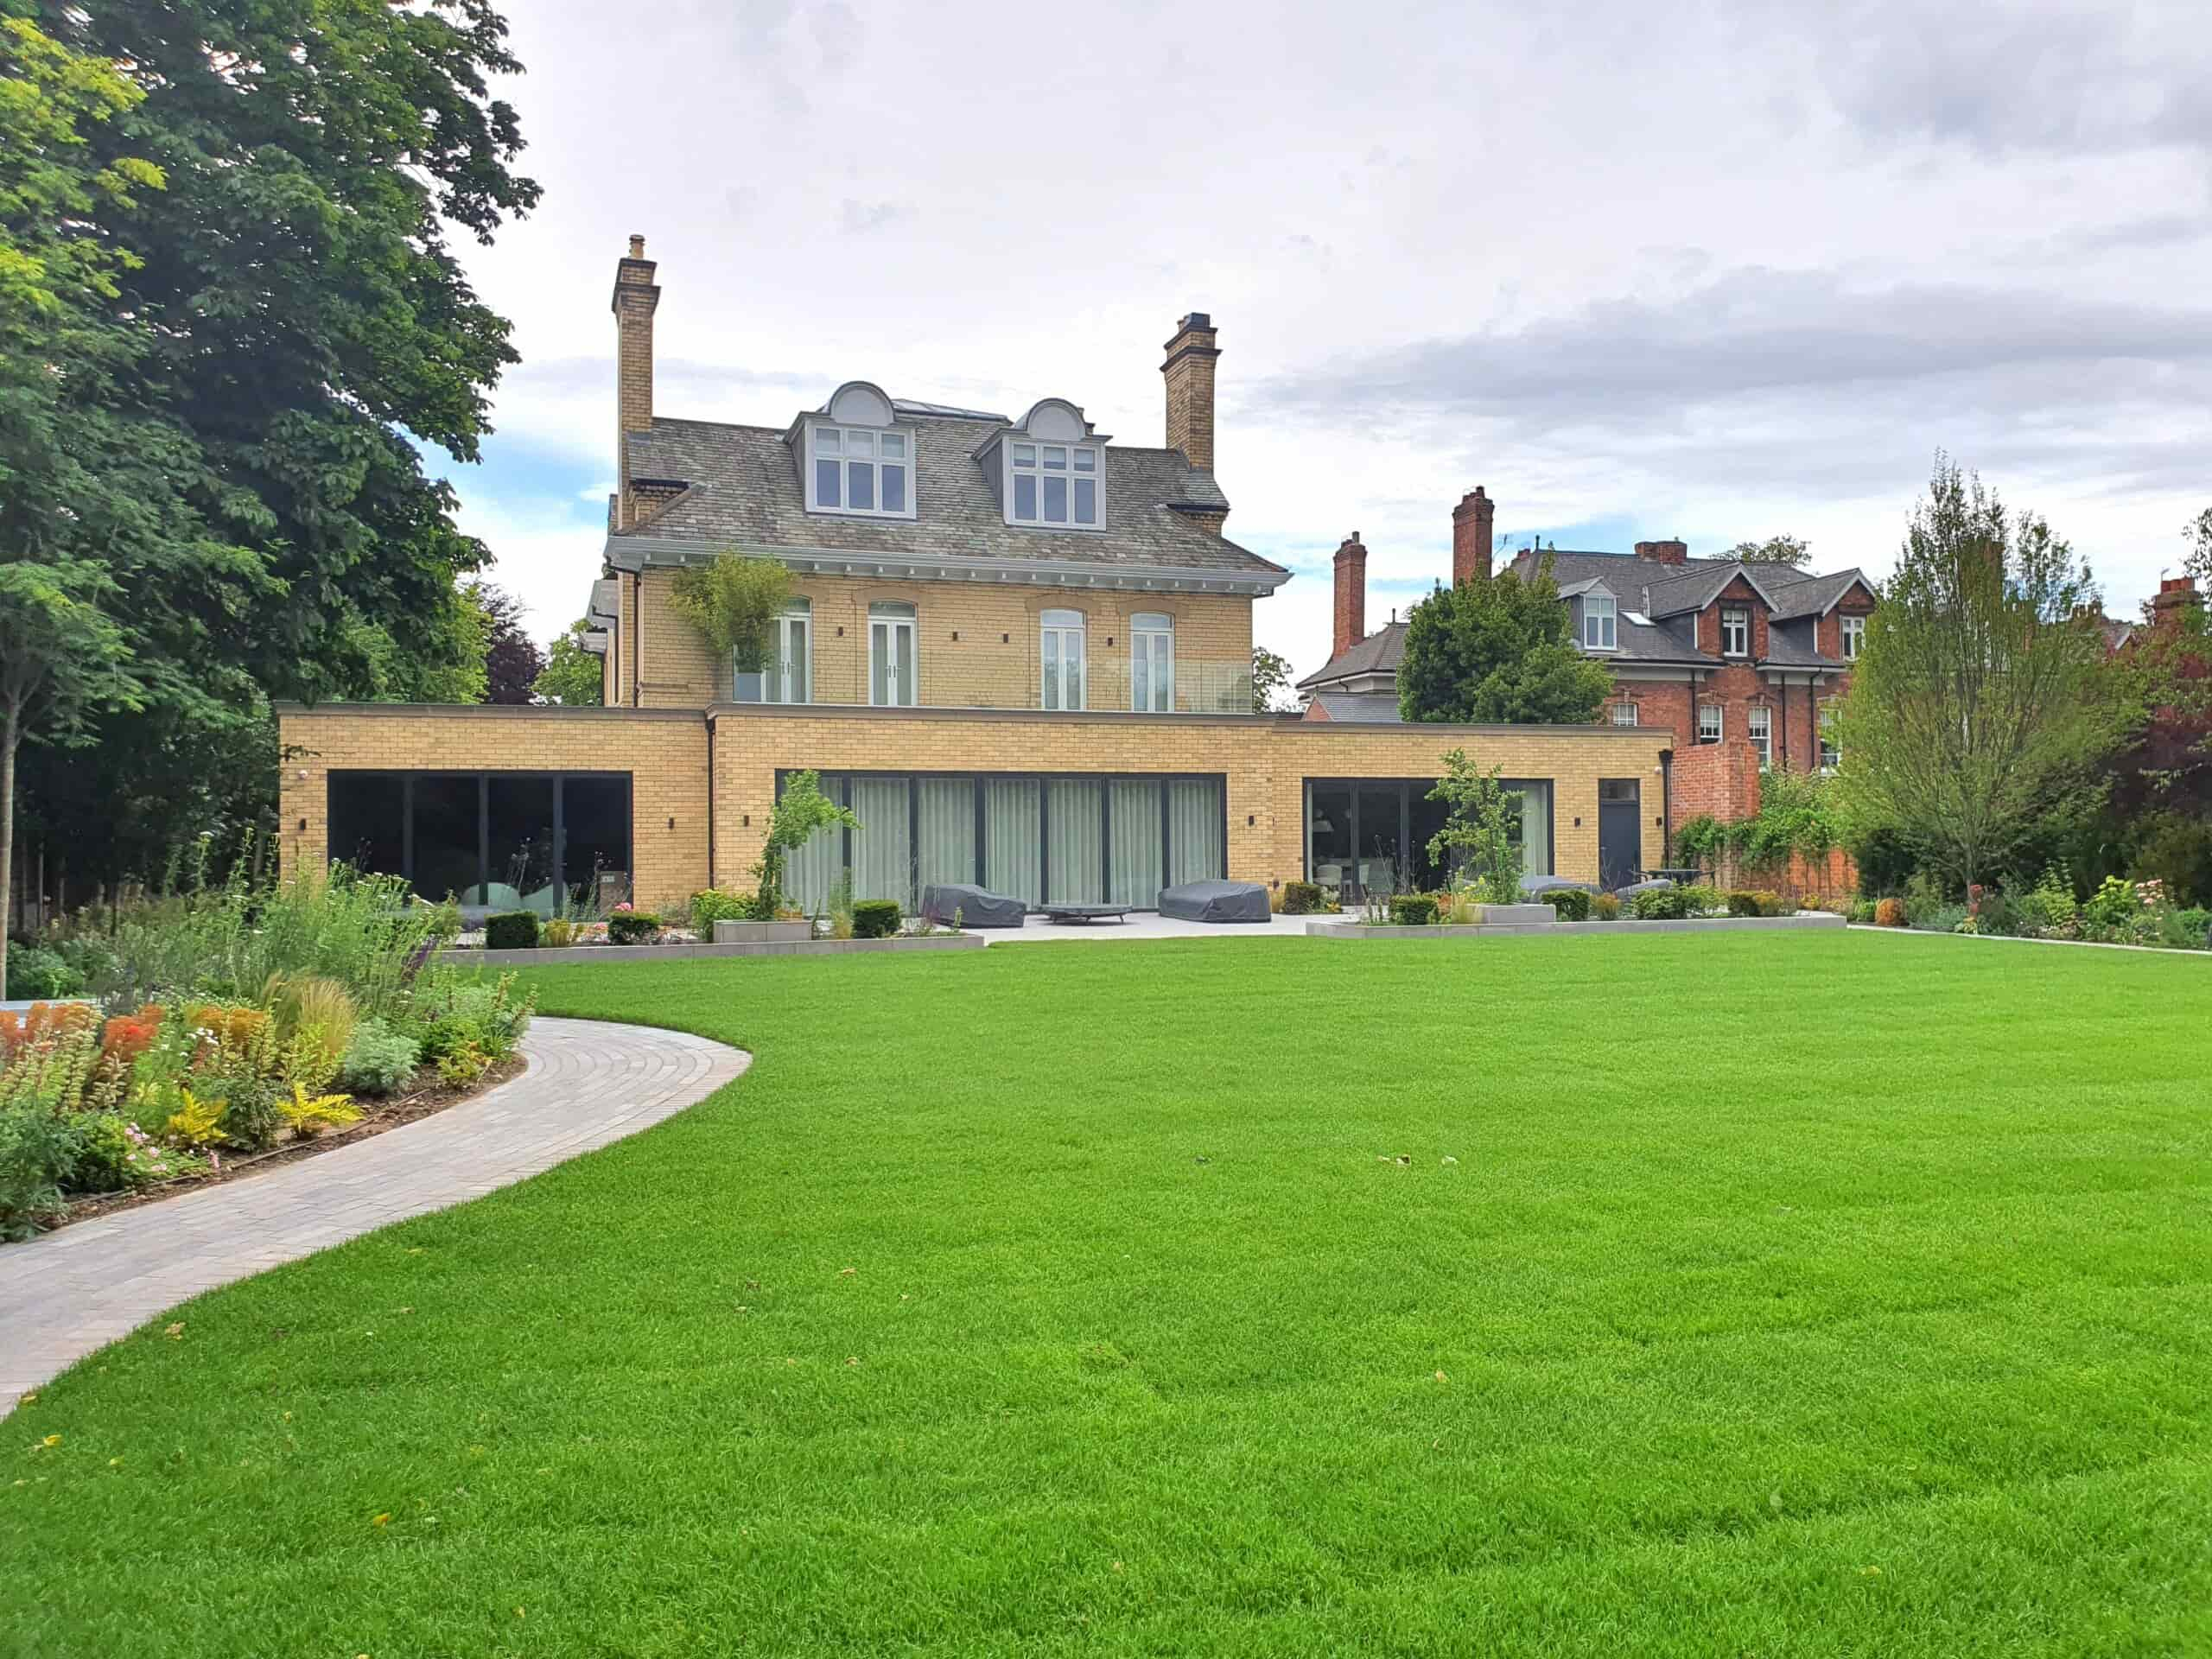 sam-nattress-gardens-landscape-design-darlington-formal-gardens